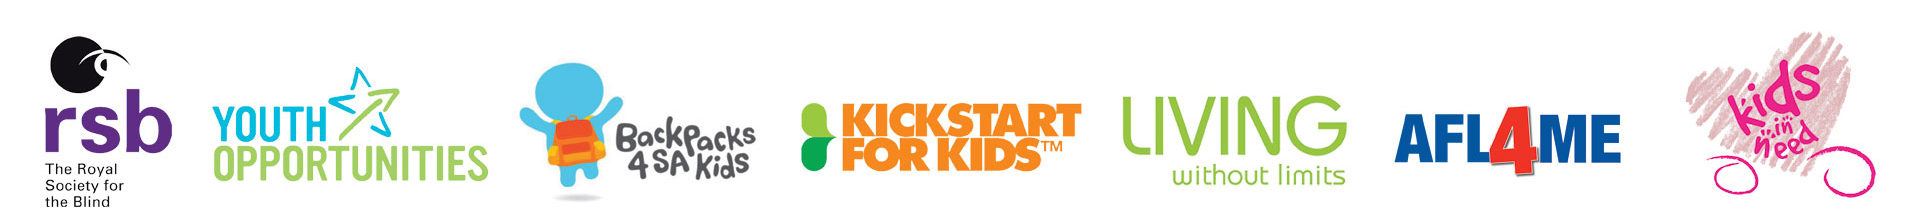 charity-logos-1920x222